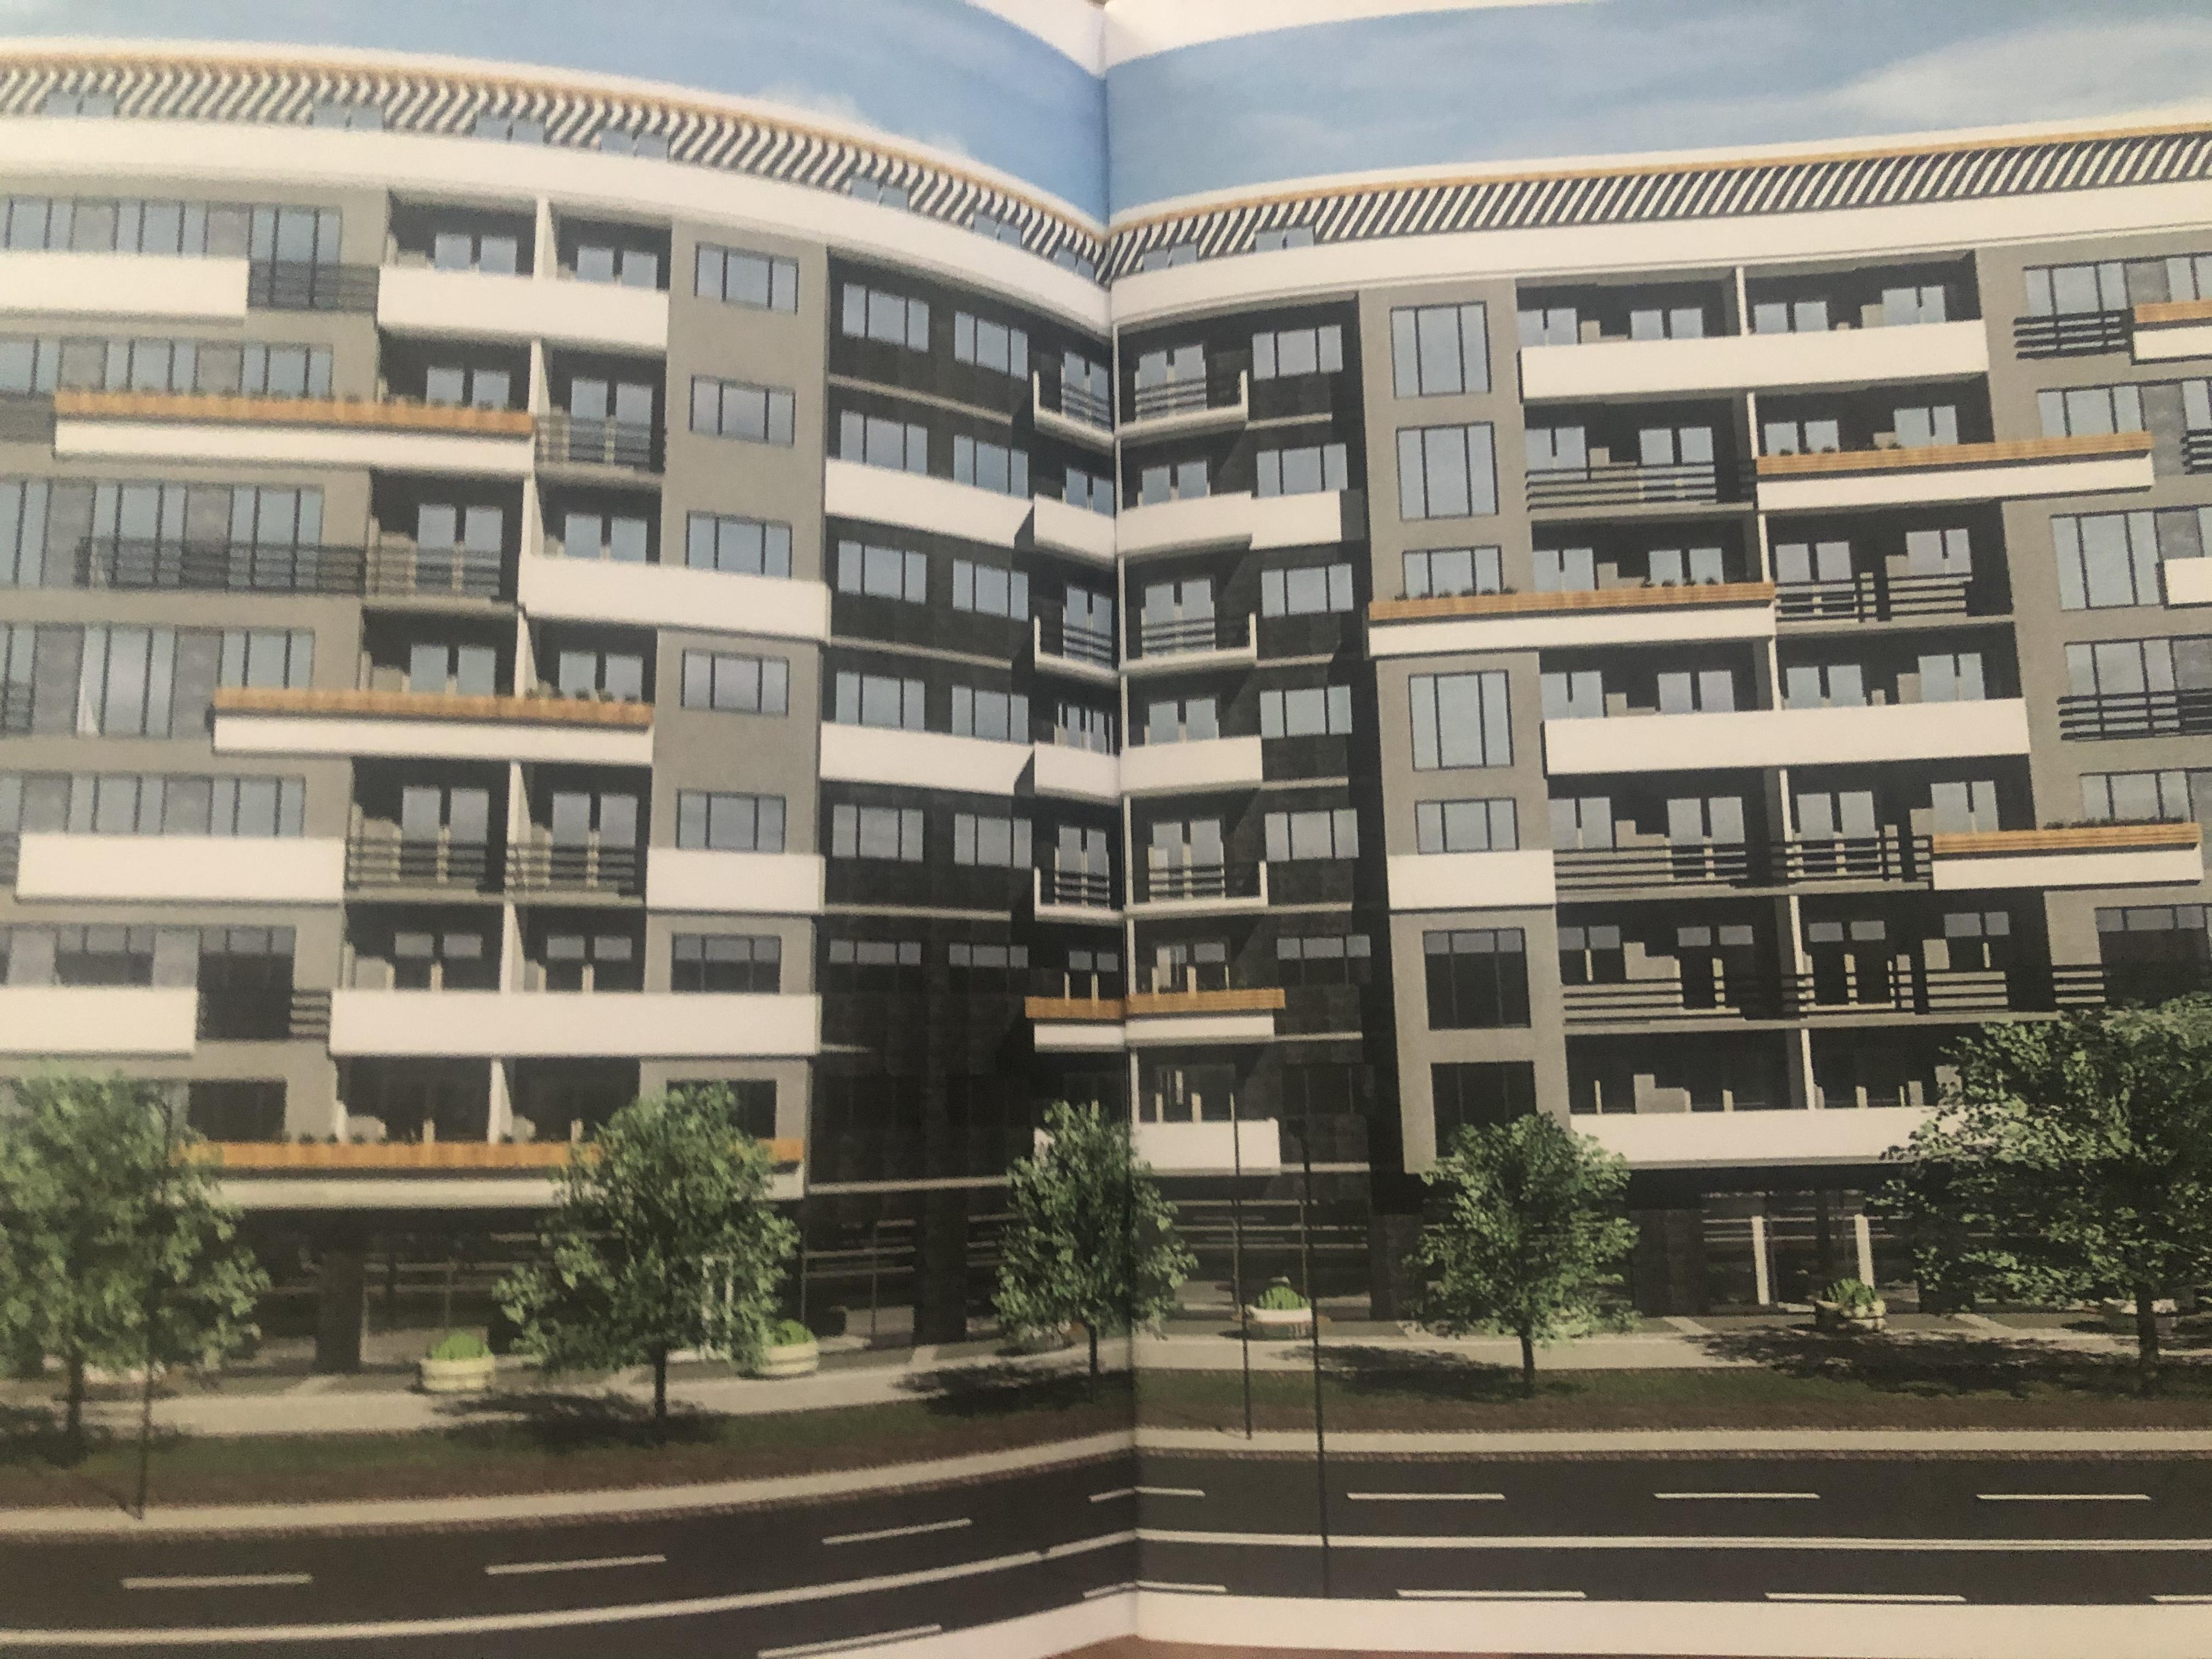 Gradezna firma prodava stanovi vo gradba